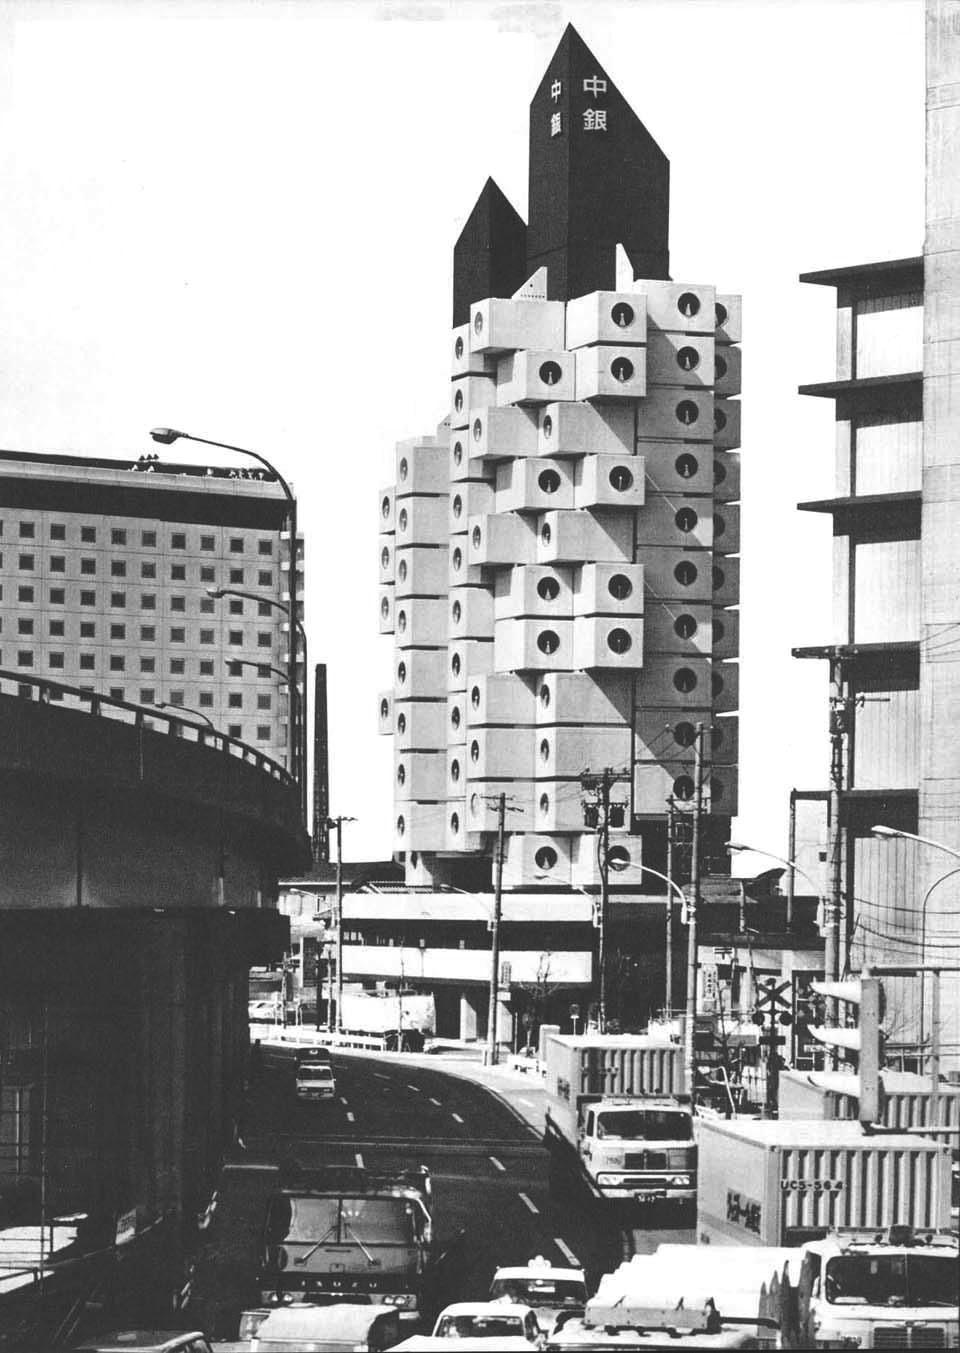 Nakagin Capsule Tower in Tokyo / Kisho Kurokawa